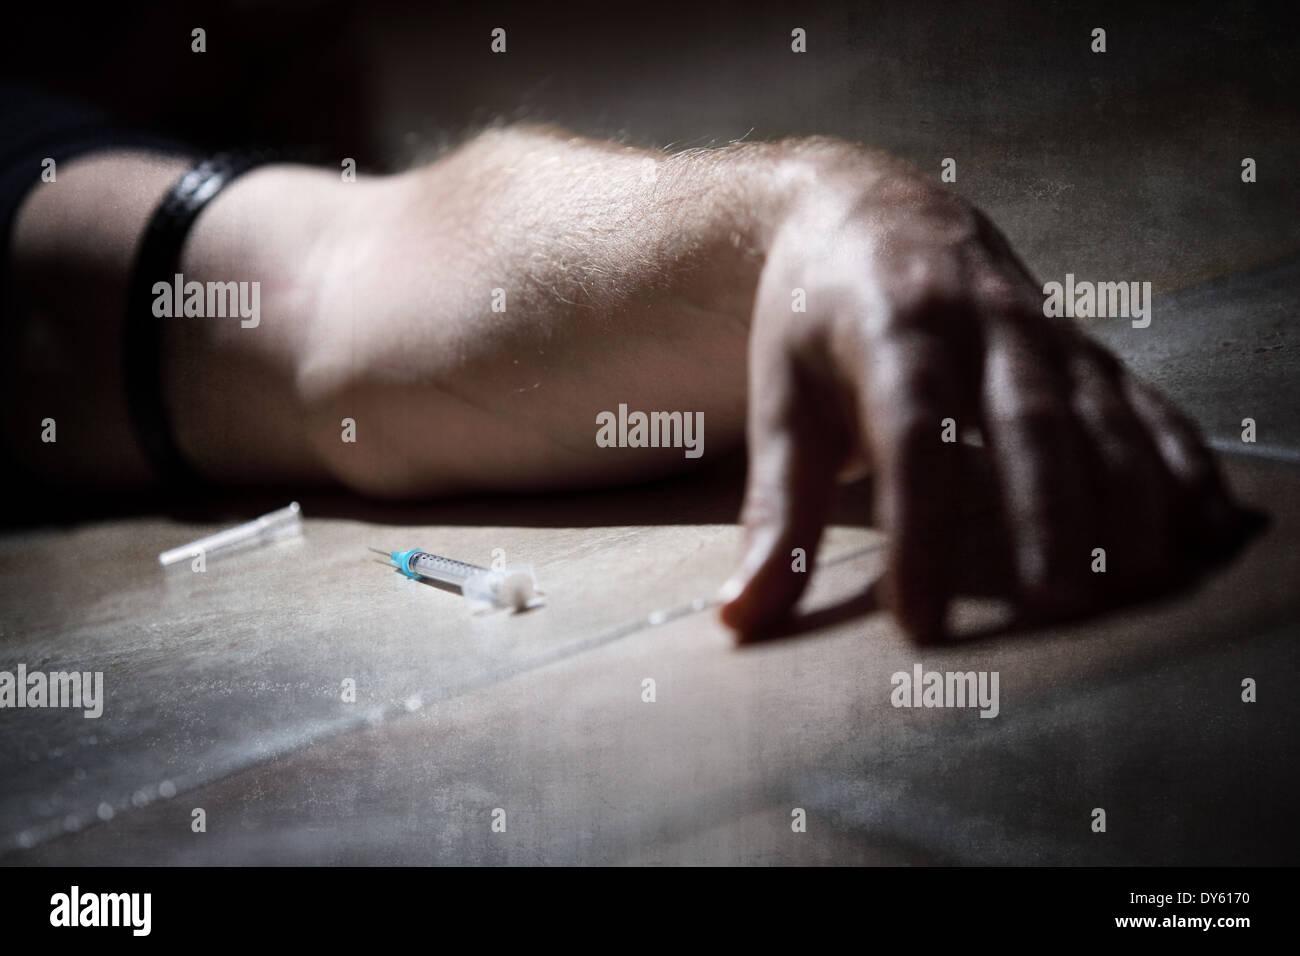 Abuso de drogas Imagen De Stock